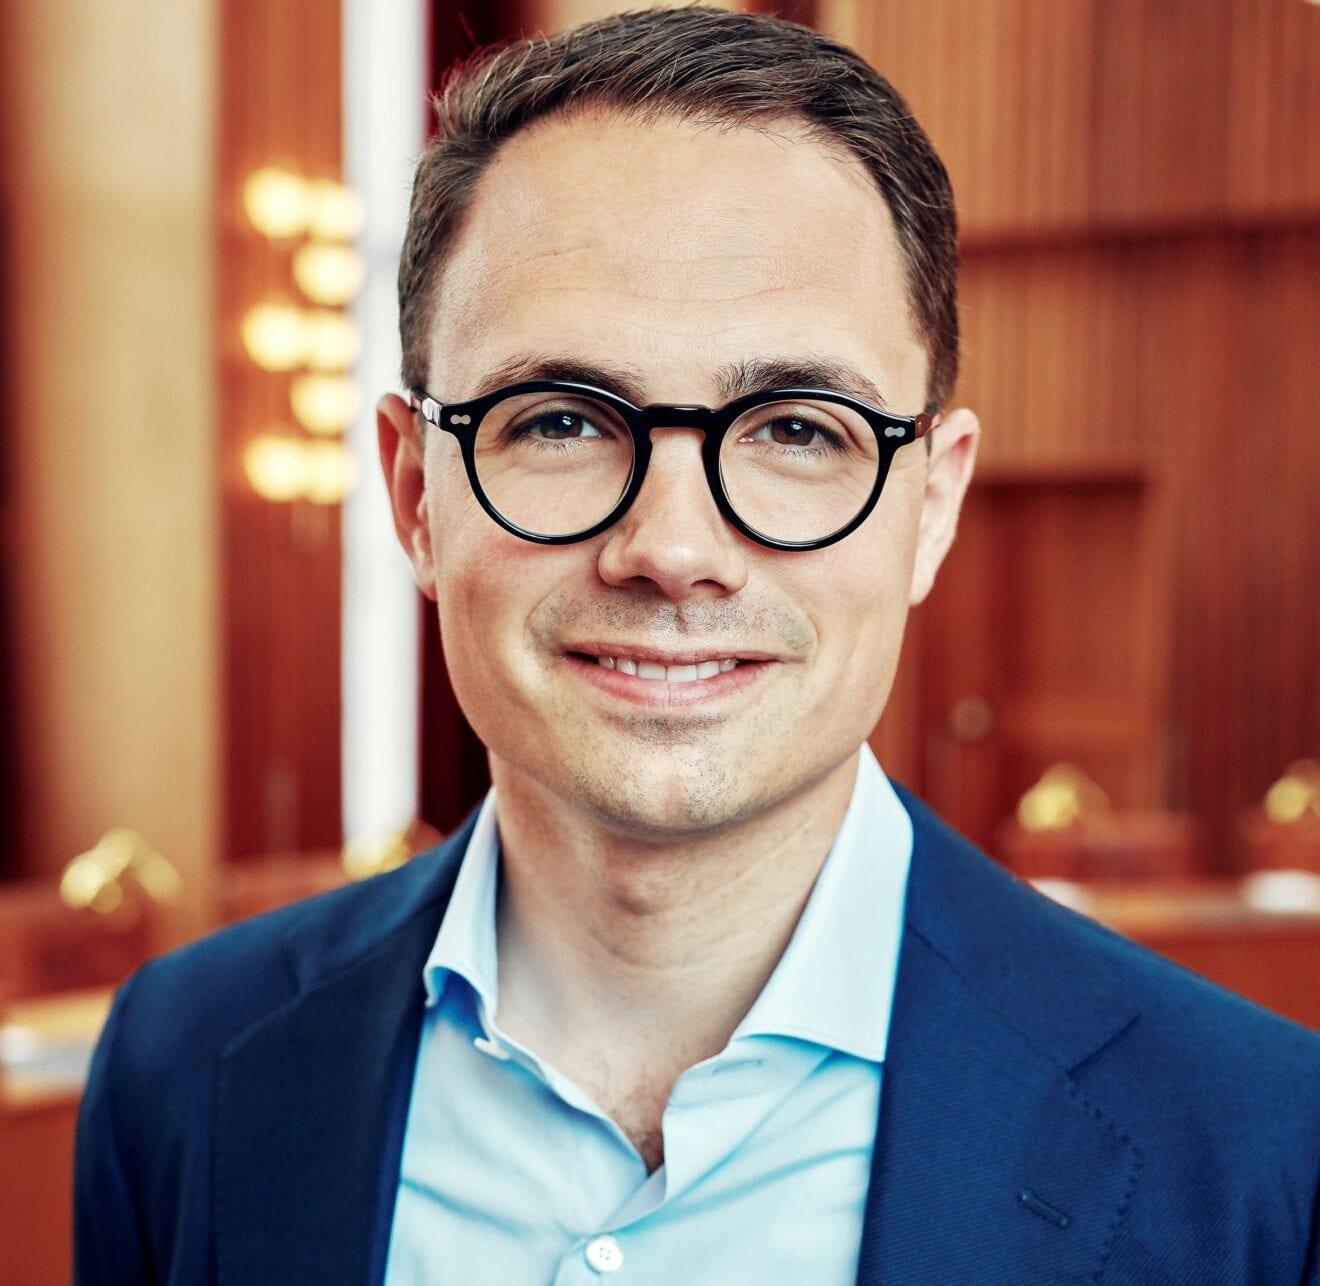 Frederiksbergs borgmester er formand for ny klimaalliance